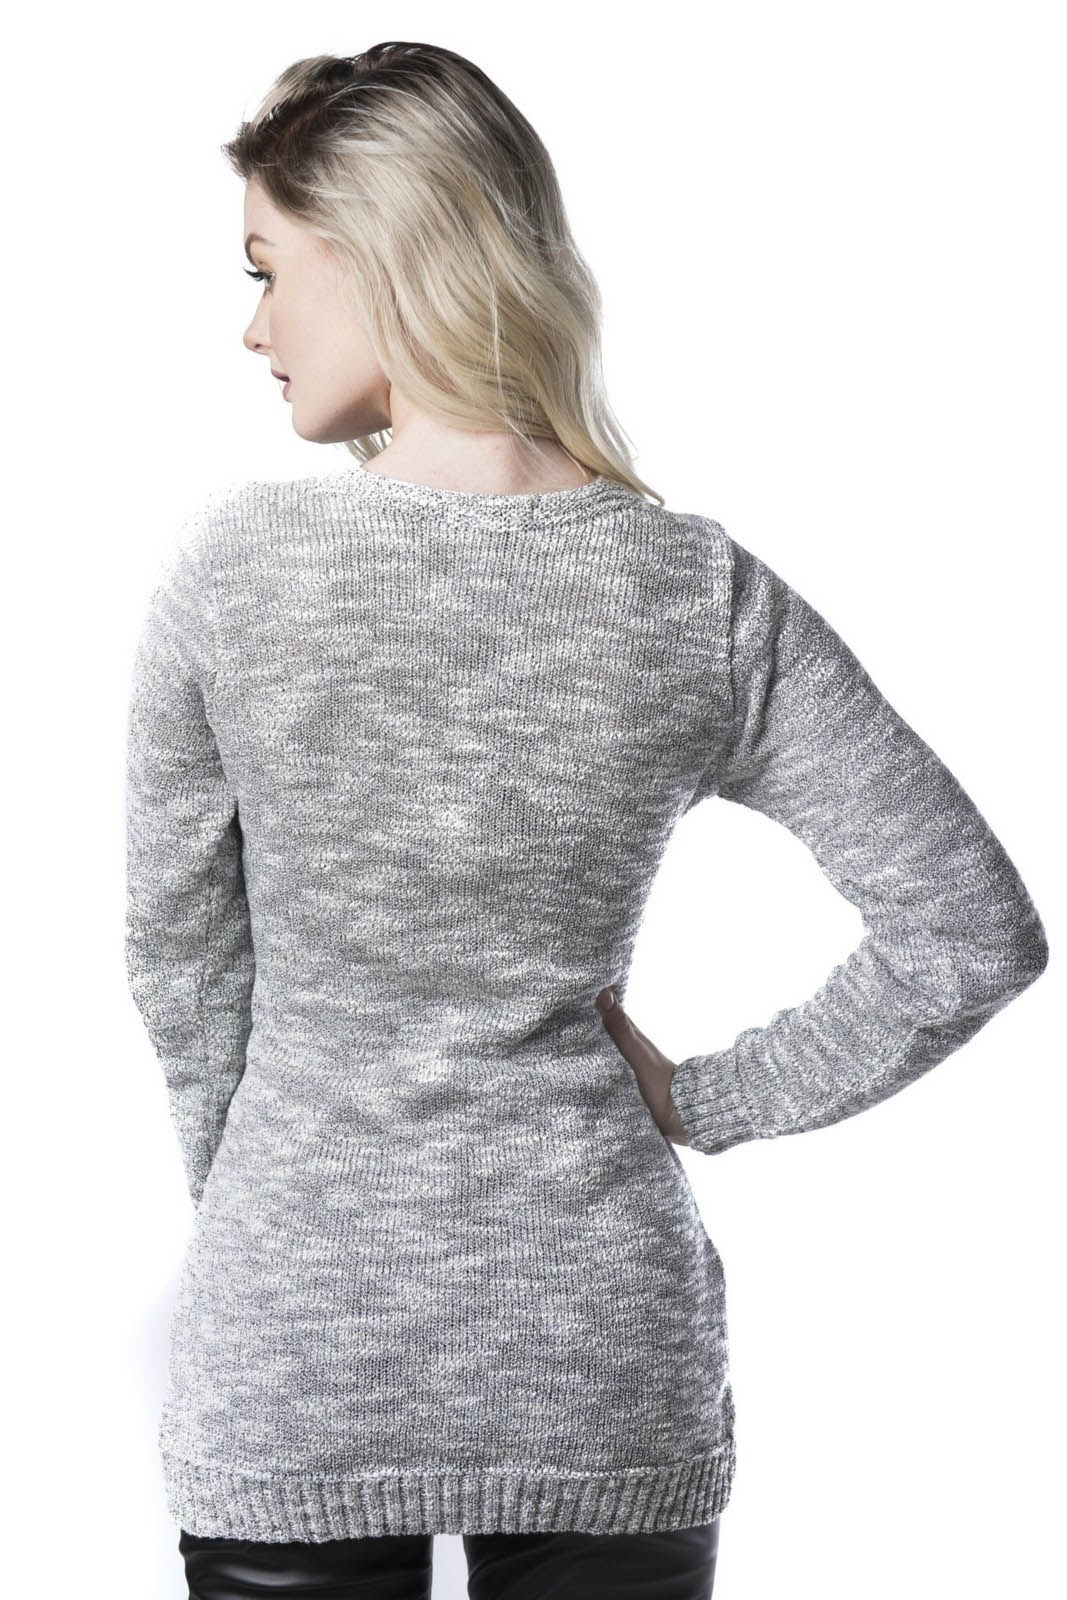 Blusa Jéssi Malhas Vest Legging Trança 3D Tricô